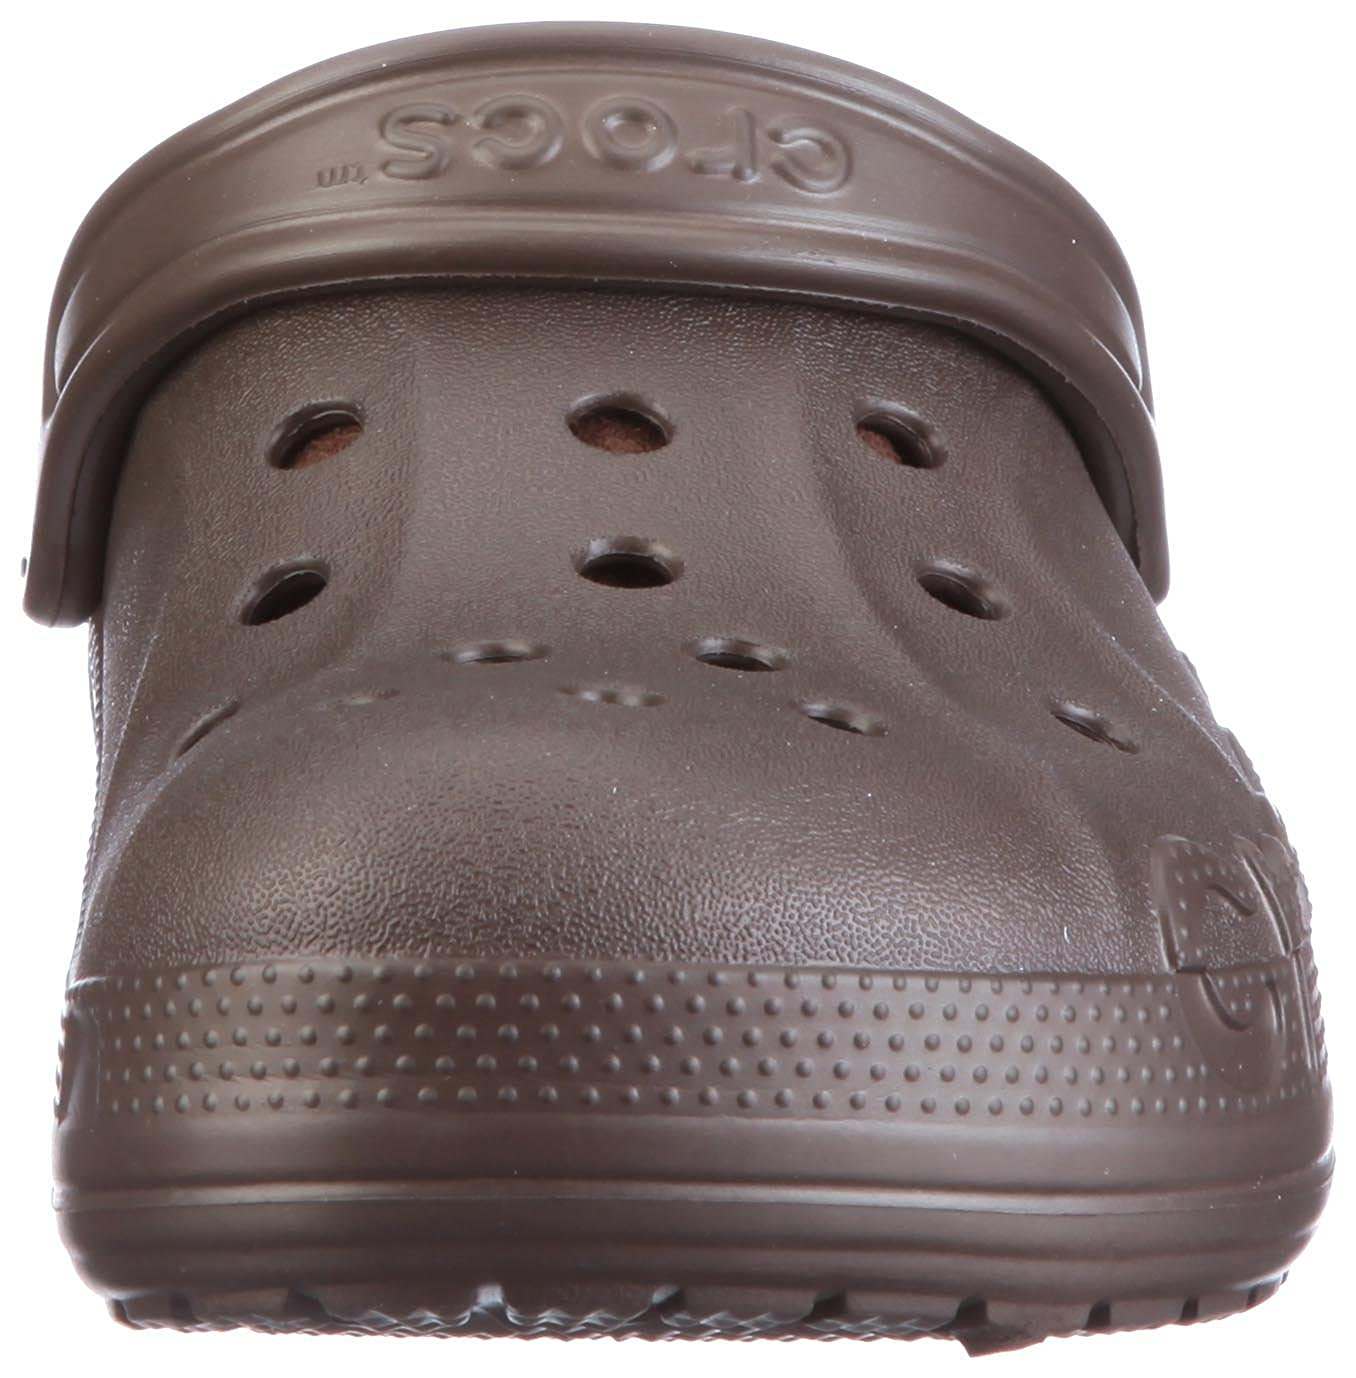 Womens 10 Medium Women/'s 10 Medium 11692-22Y Crocs Unisex Baya Lined Espresso//Khaki Clogs Mens 8